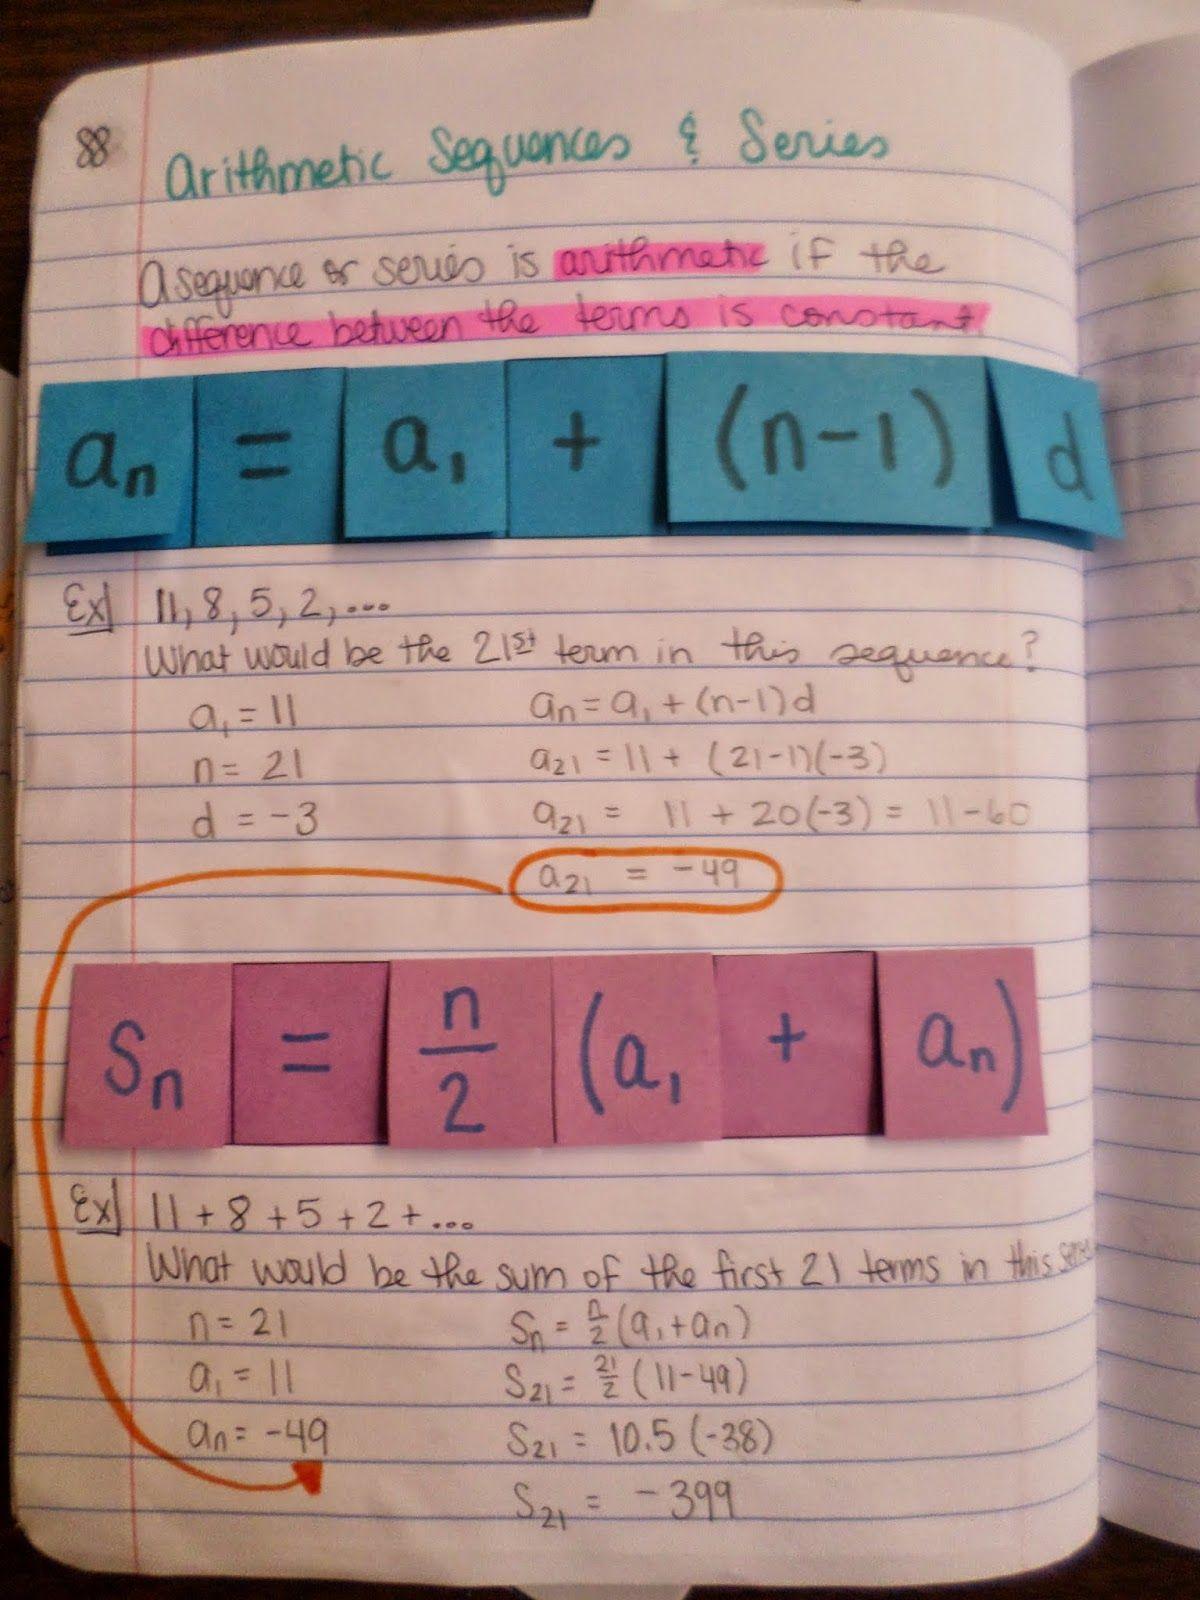 medium resolution of 71 Arithmetic and geometric sequences ideas   geometric sequences